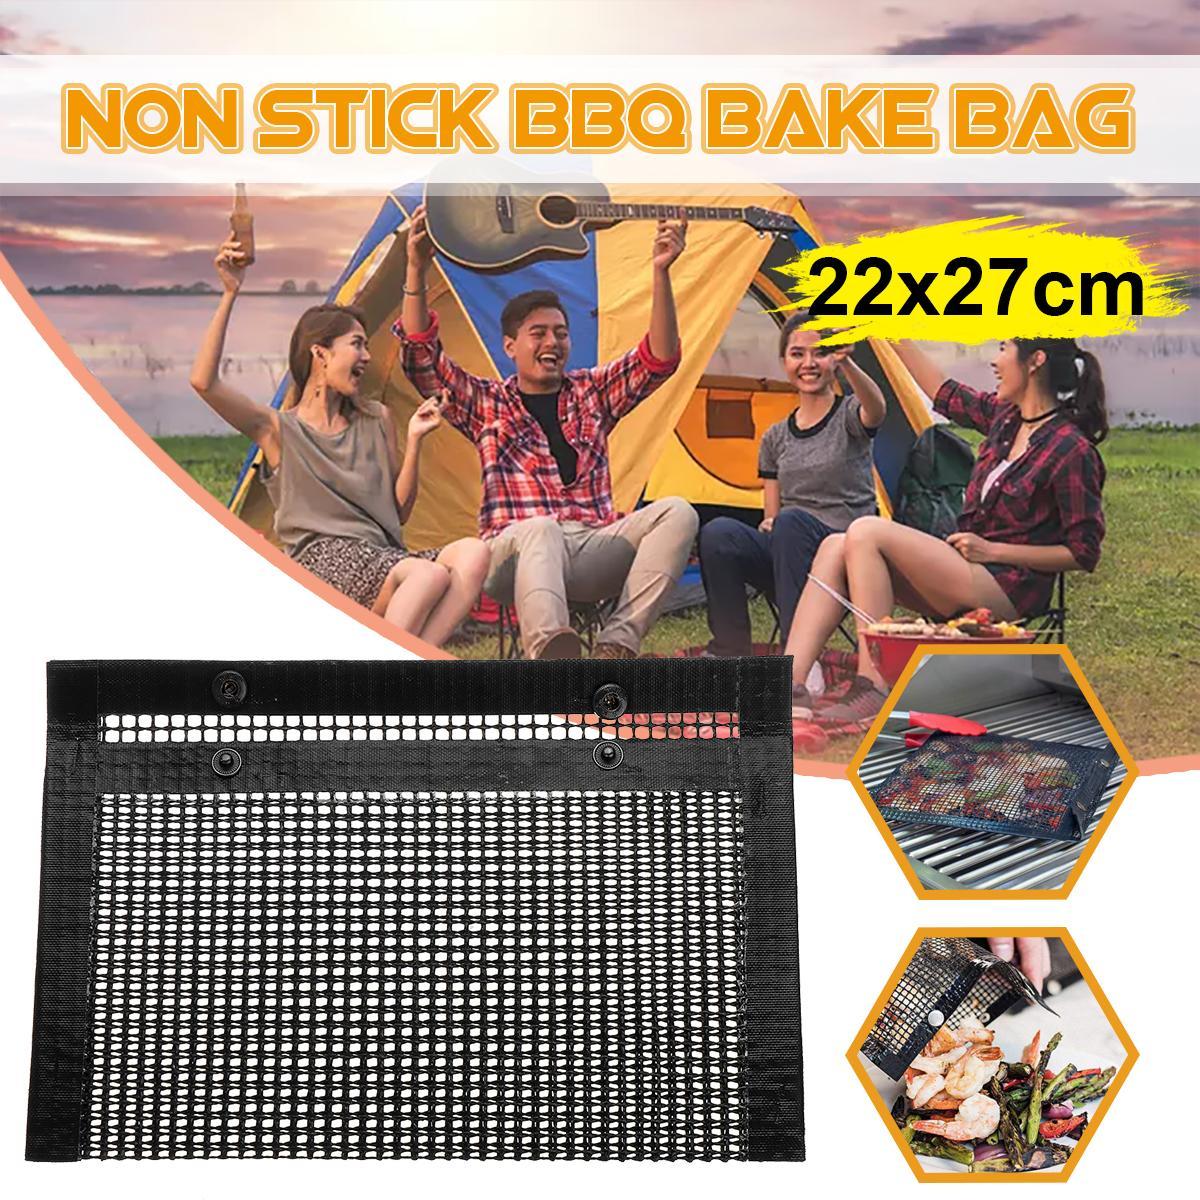 Hot Non-Stick PTFE Mesh Grilling Bag Non-Stick BBQ Bake Bag Outdoor Picnic Tool